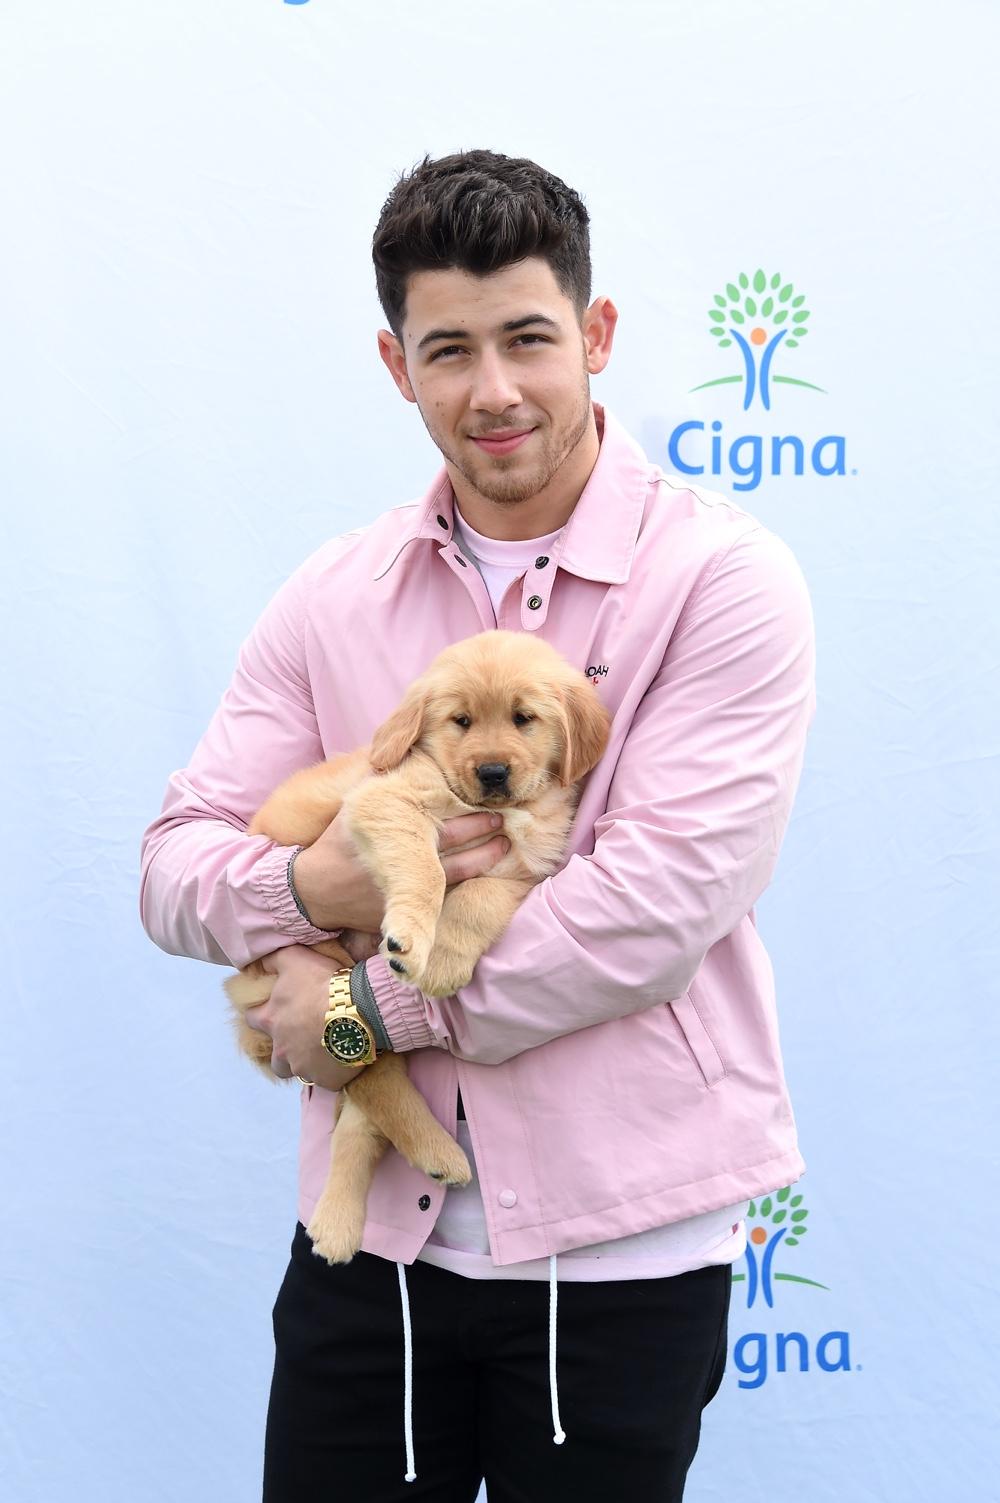 Nick Jonas Spreads Awareness of Cigna's Body & Mind Initiative